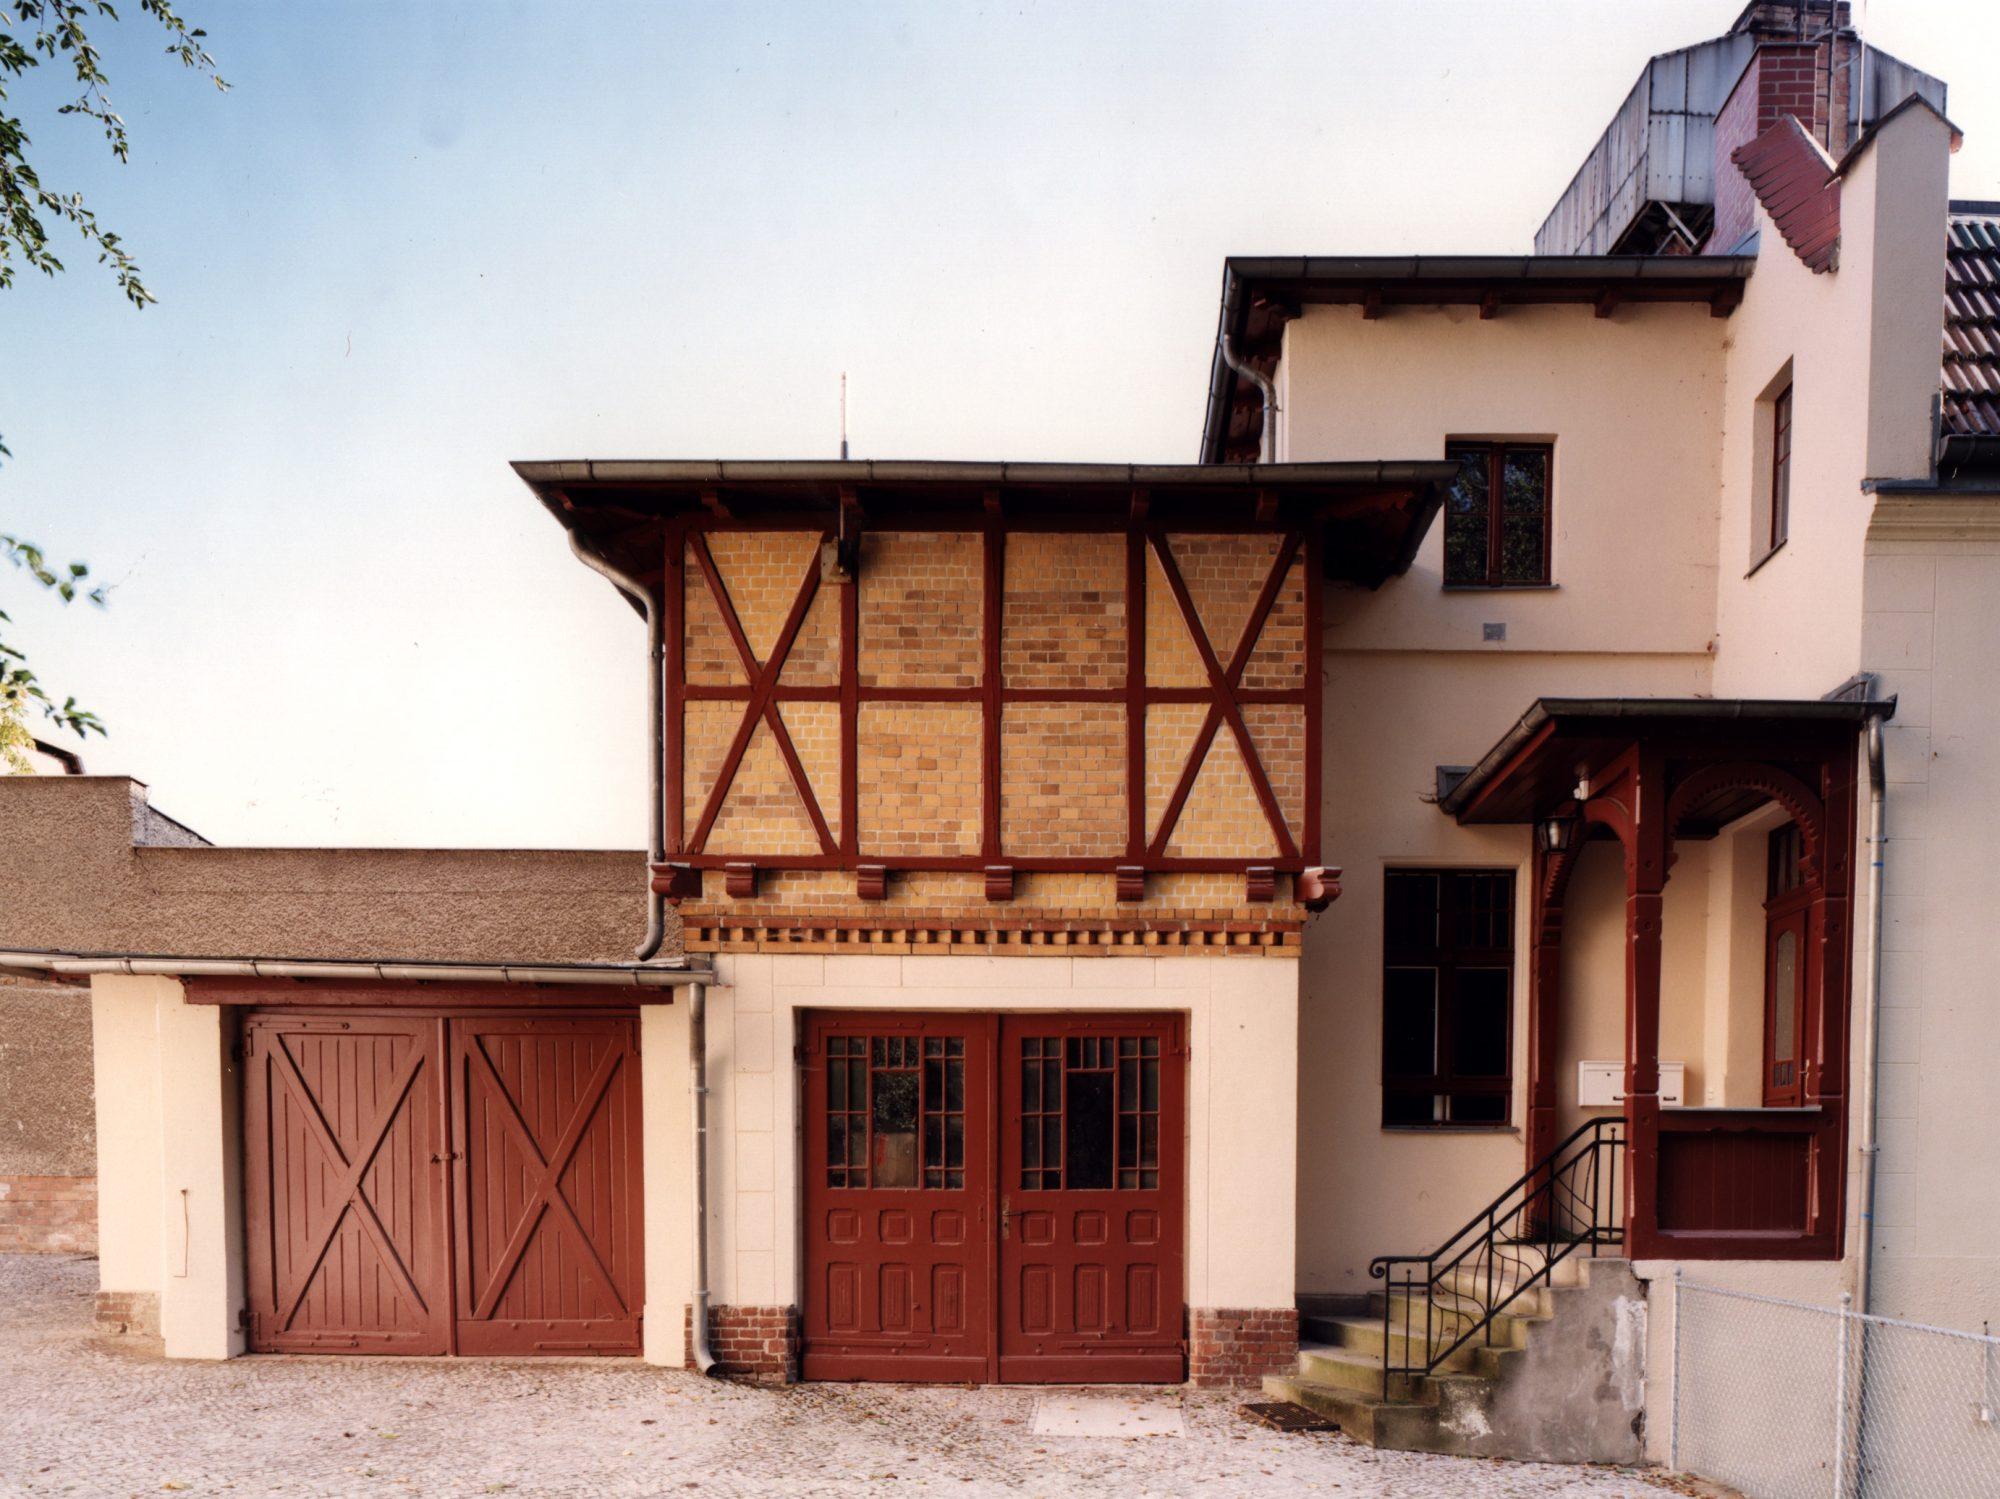 Villa Balthasar